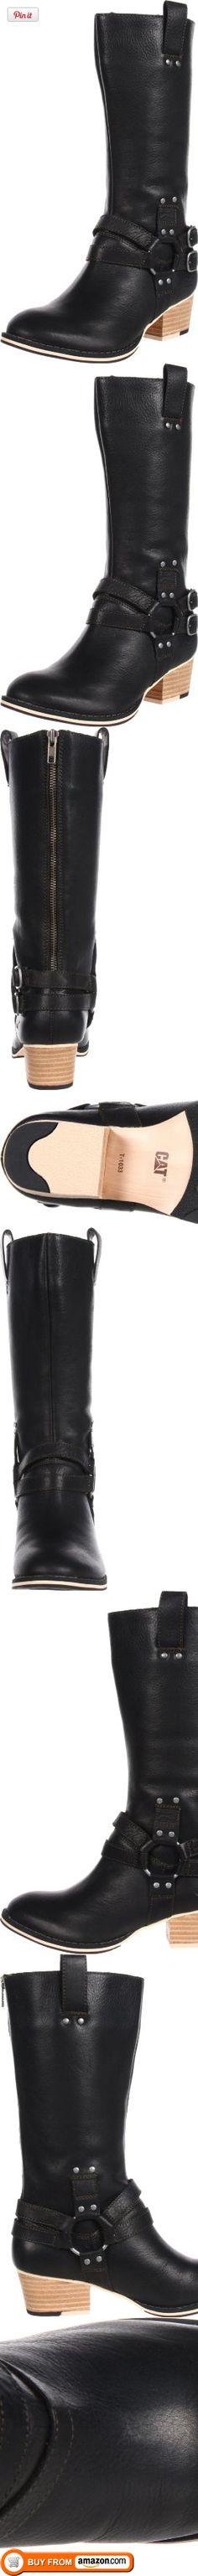 Caterpillar Women's Rosie boot, black.